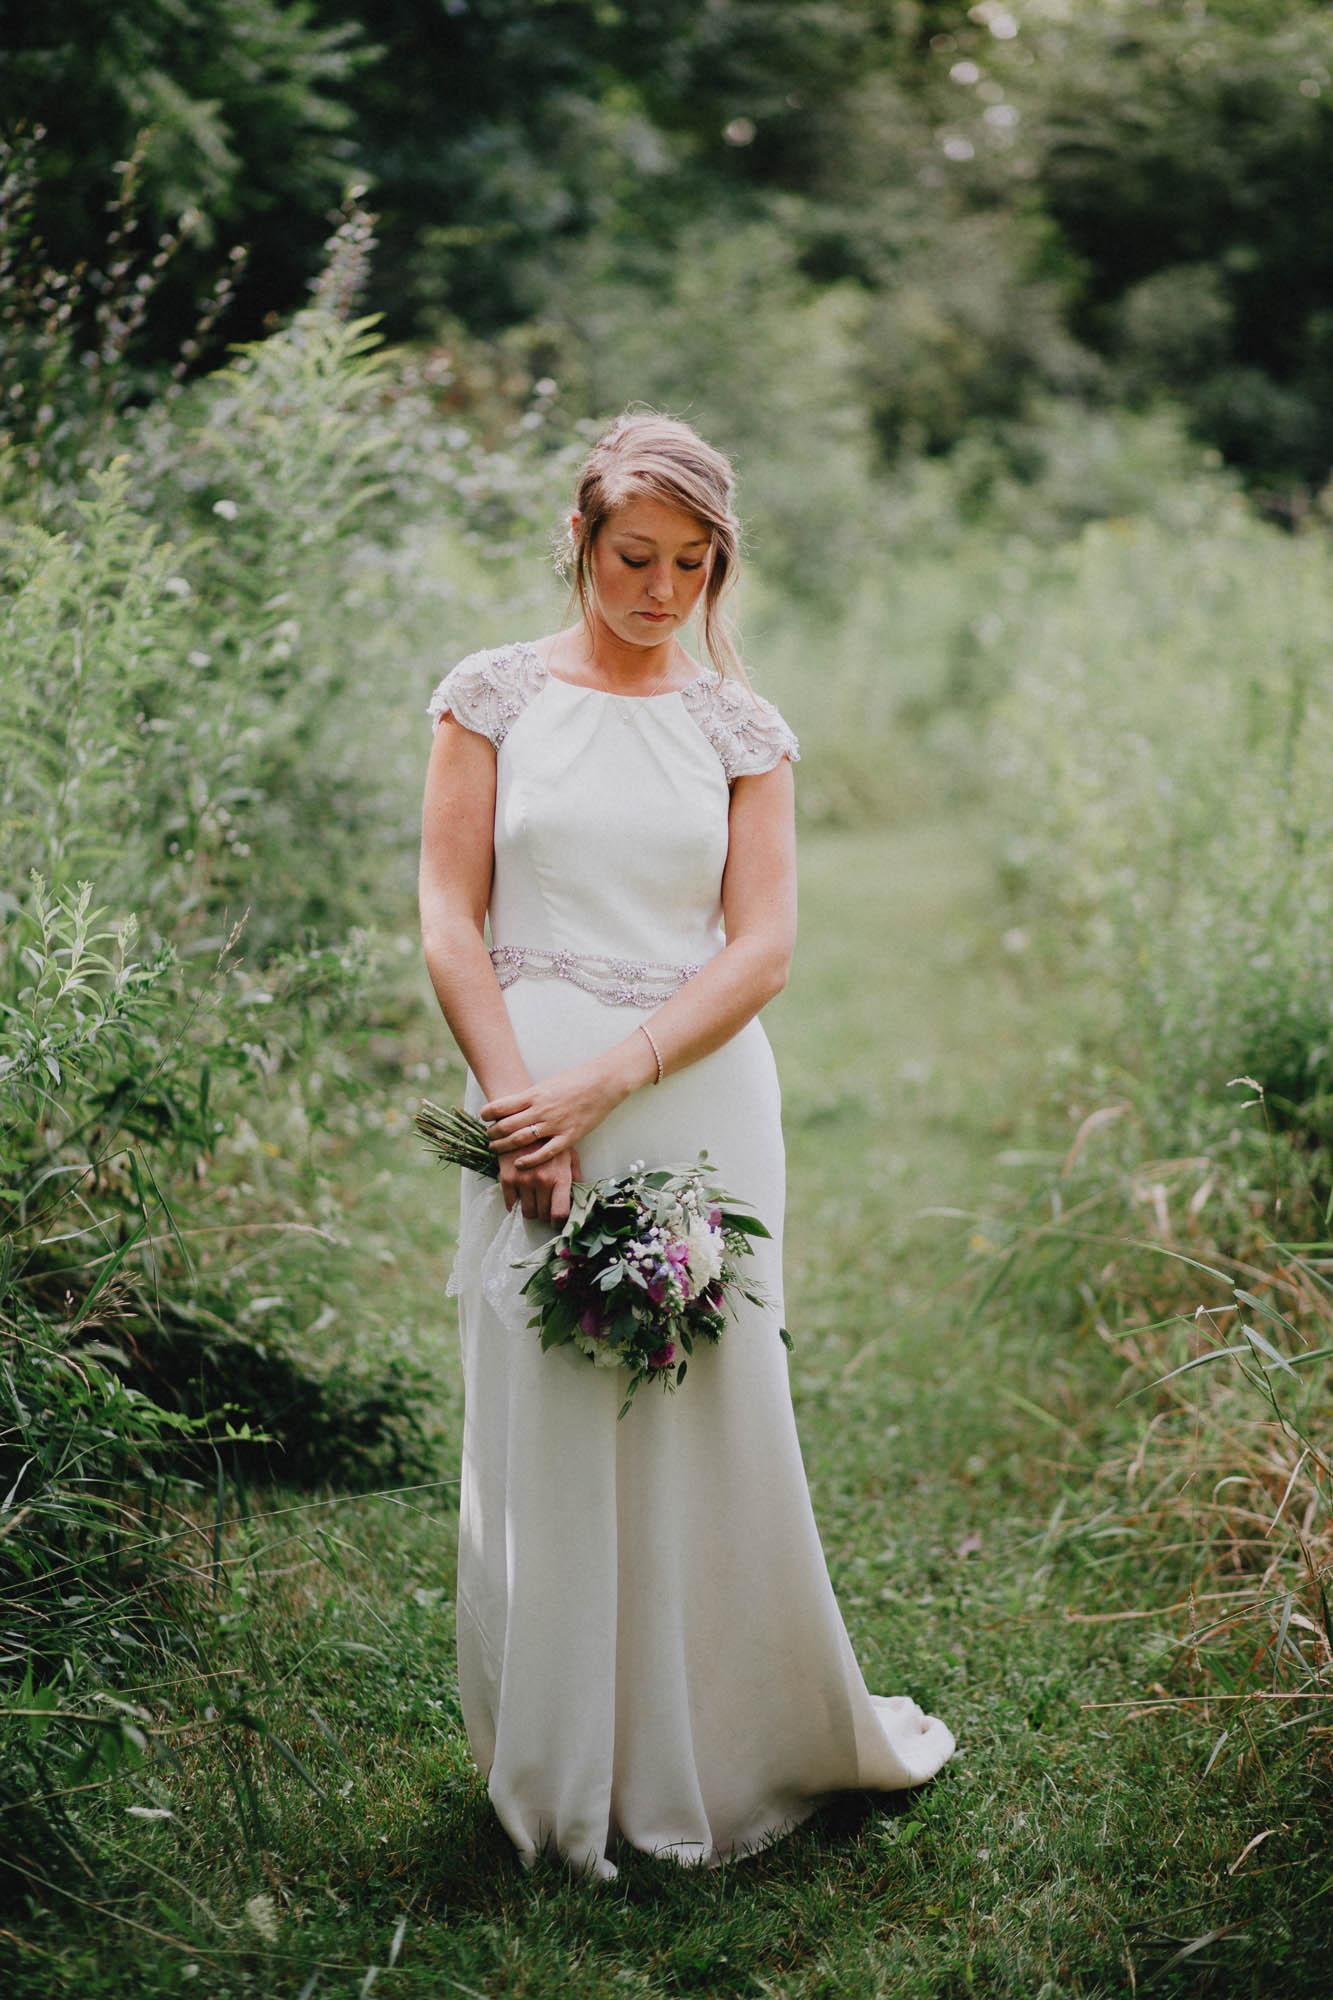 Leah-Graham-Michigan-Outdoor-DIY-Wedding-090@2x.jpg